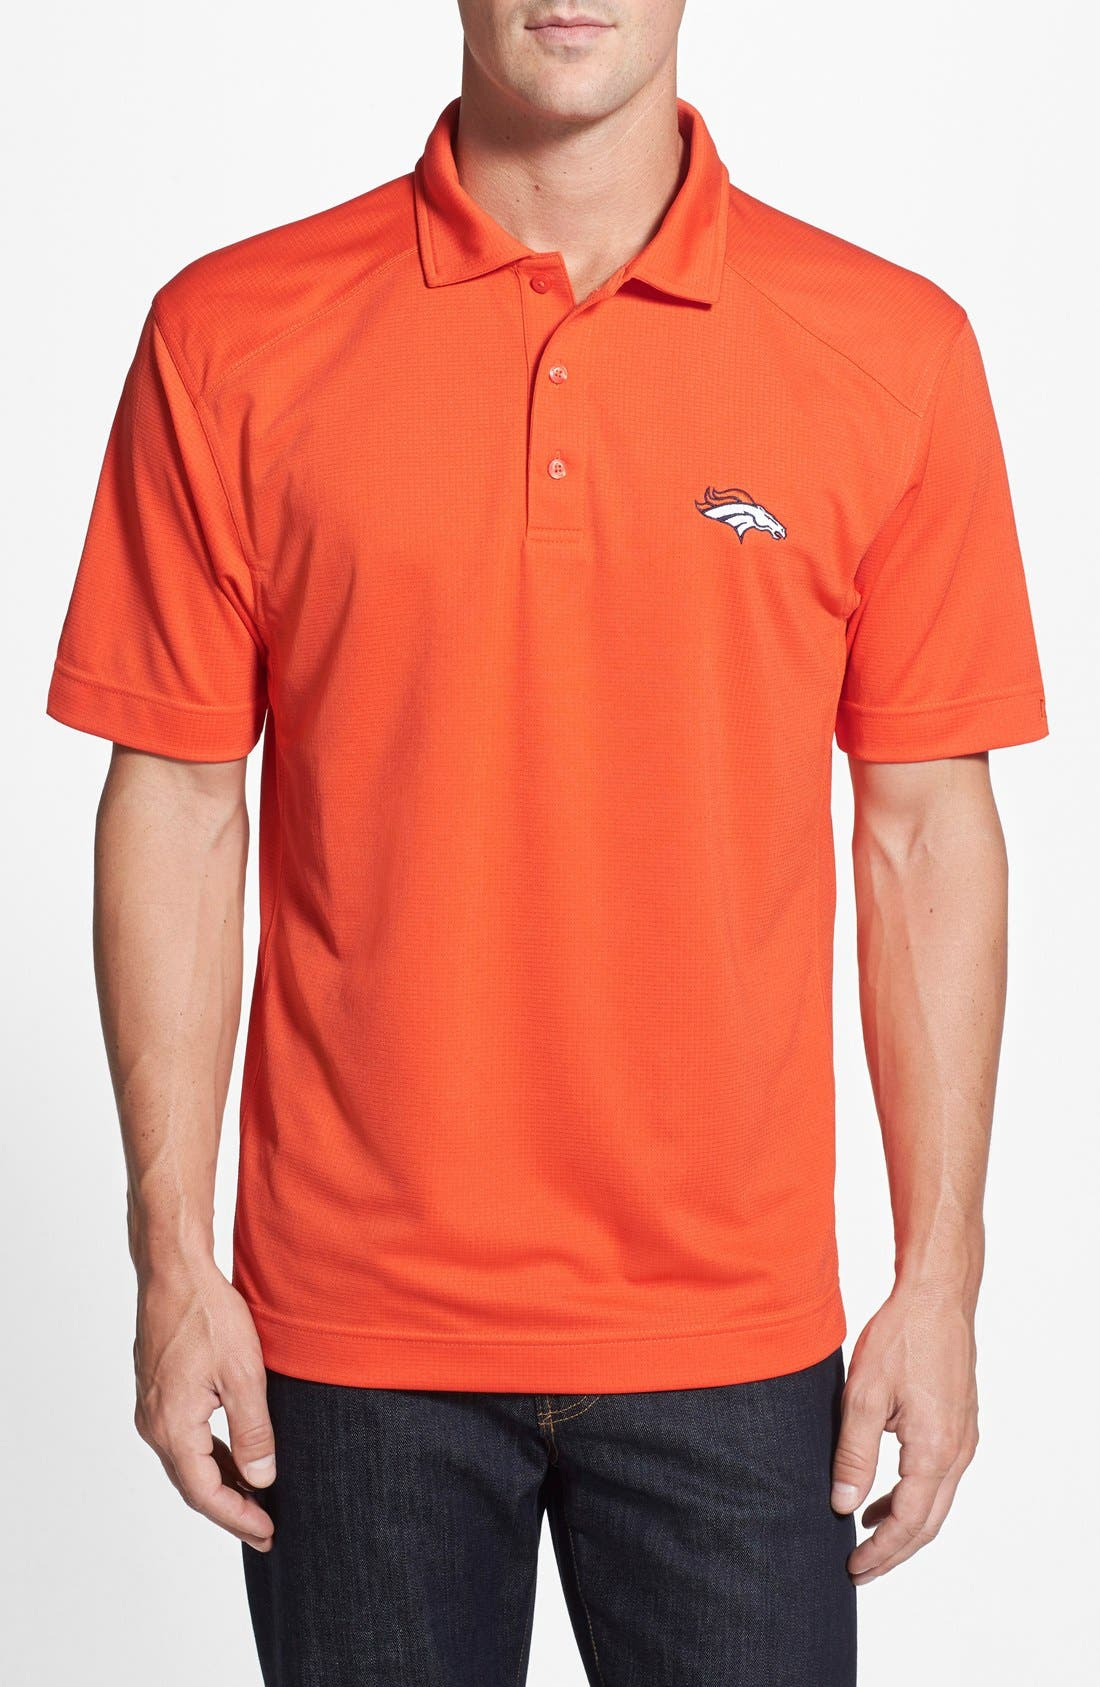 Denver Broncos - Genre DryTec Moisture Wicking Polo,                             Main thumbnail 2, color,